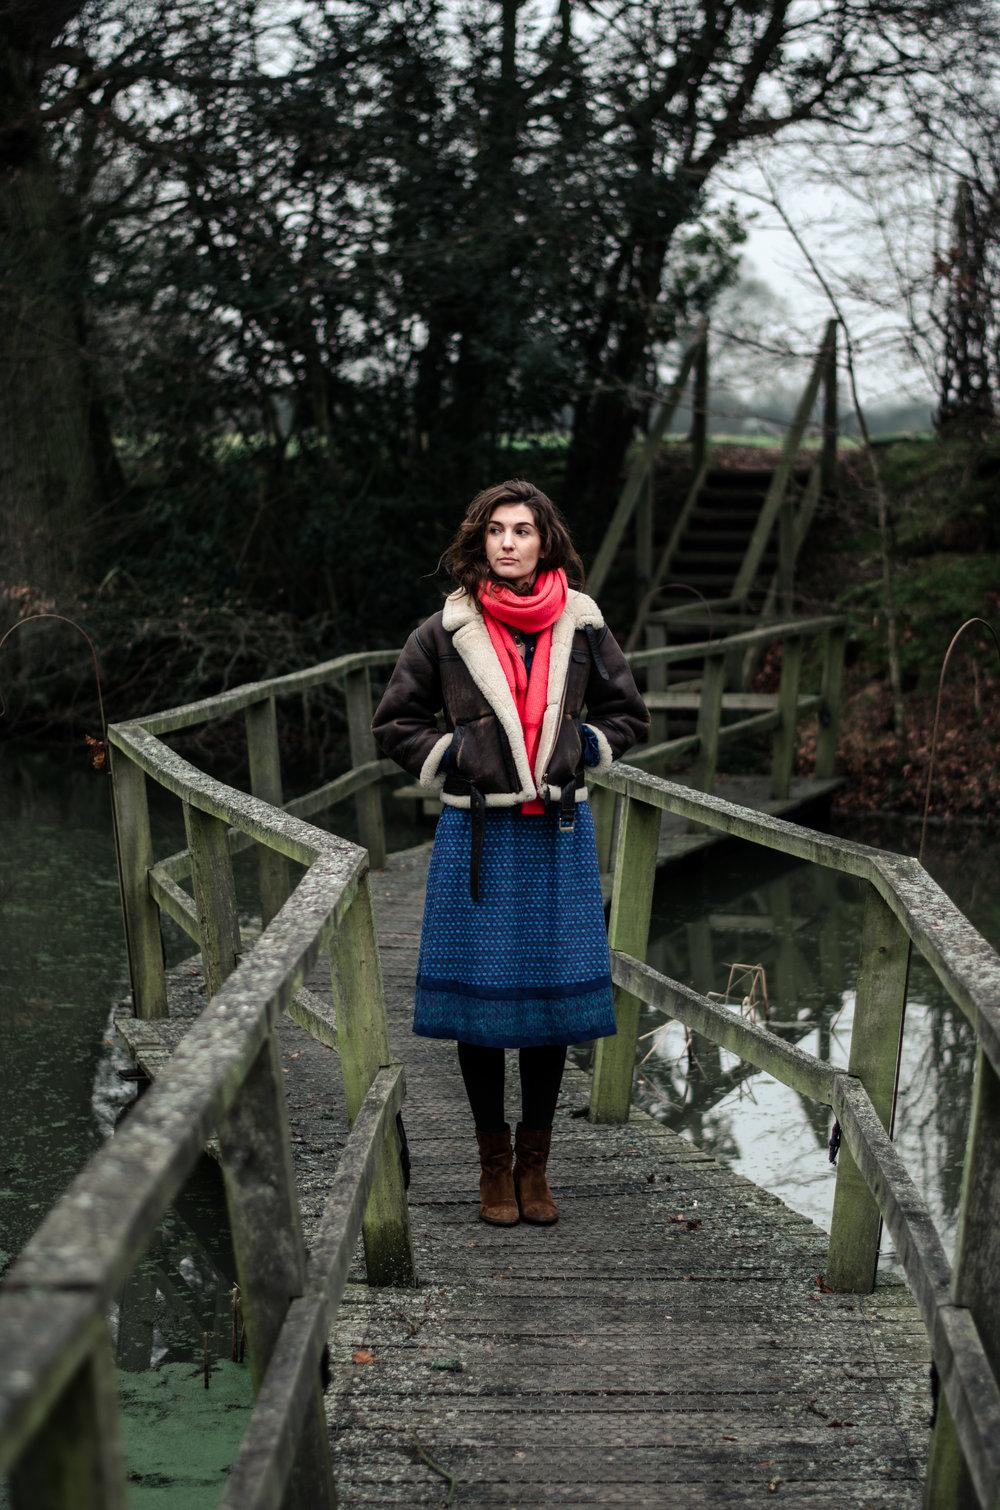 Chloe - Portraits - Aiste Saulyte Photography - 2018-01-05-53.jpg